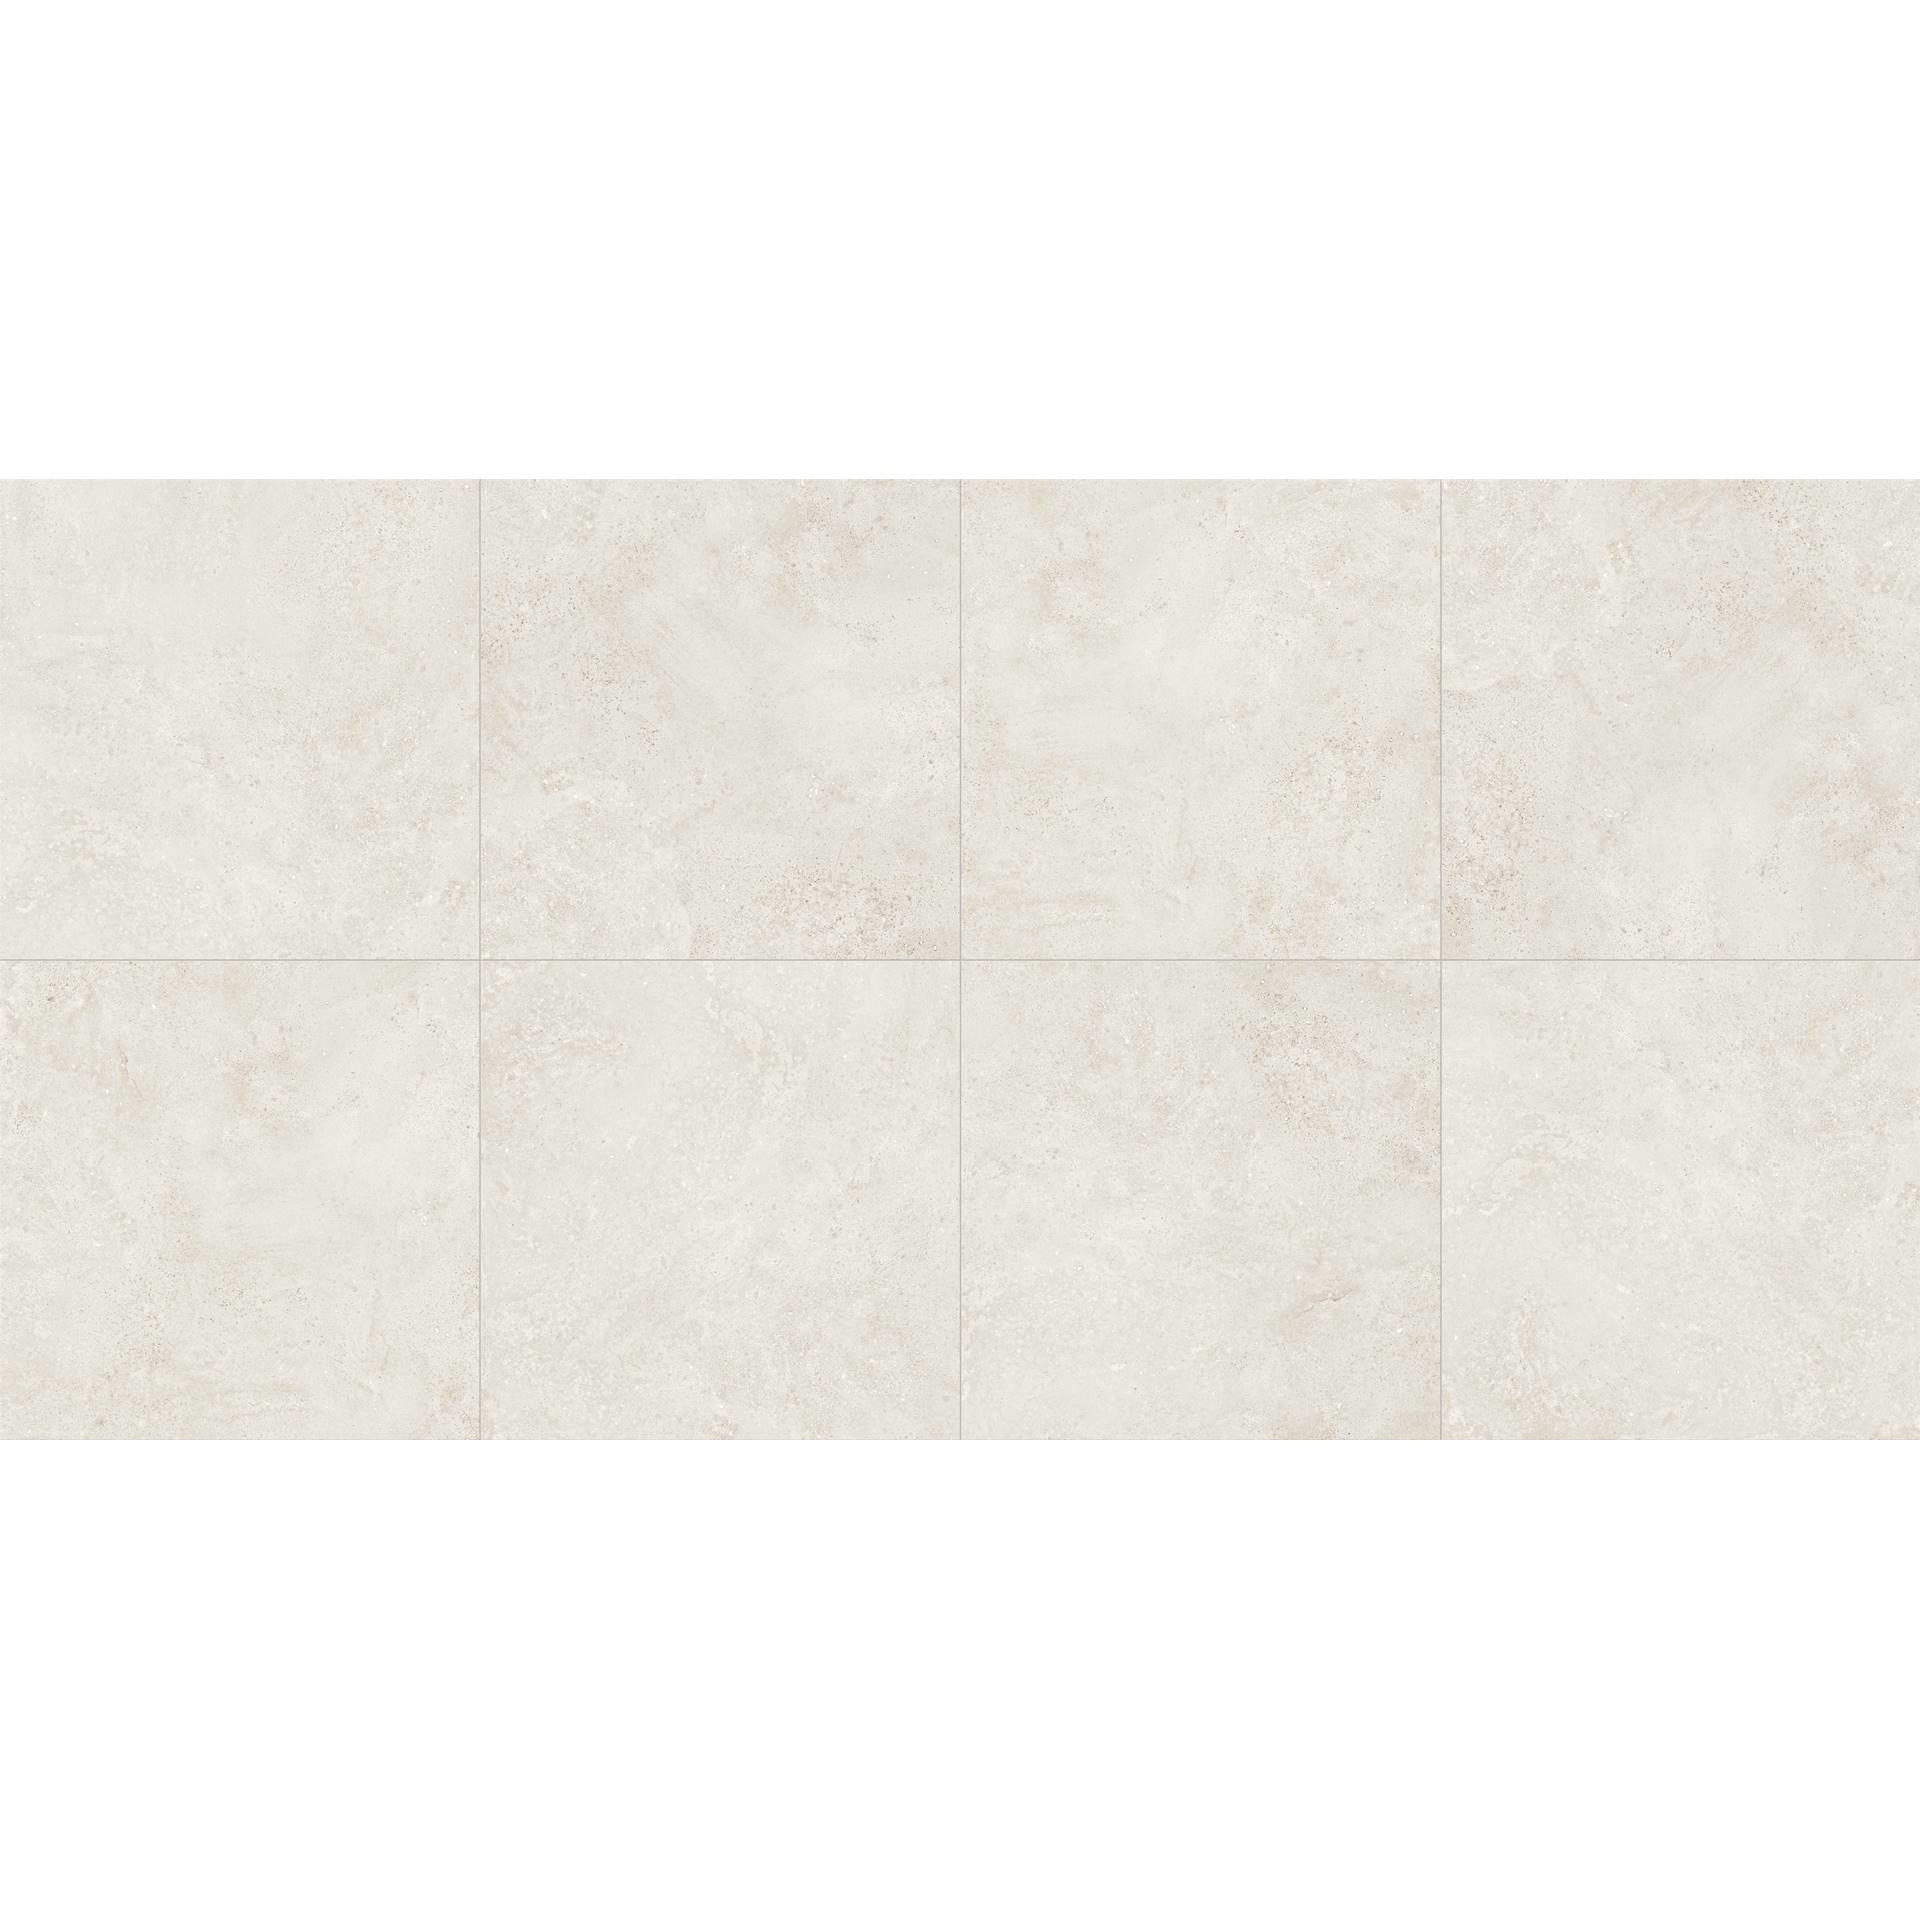 Porcelanato Cathedral Off White 108x108cm Cx.2,33